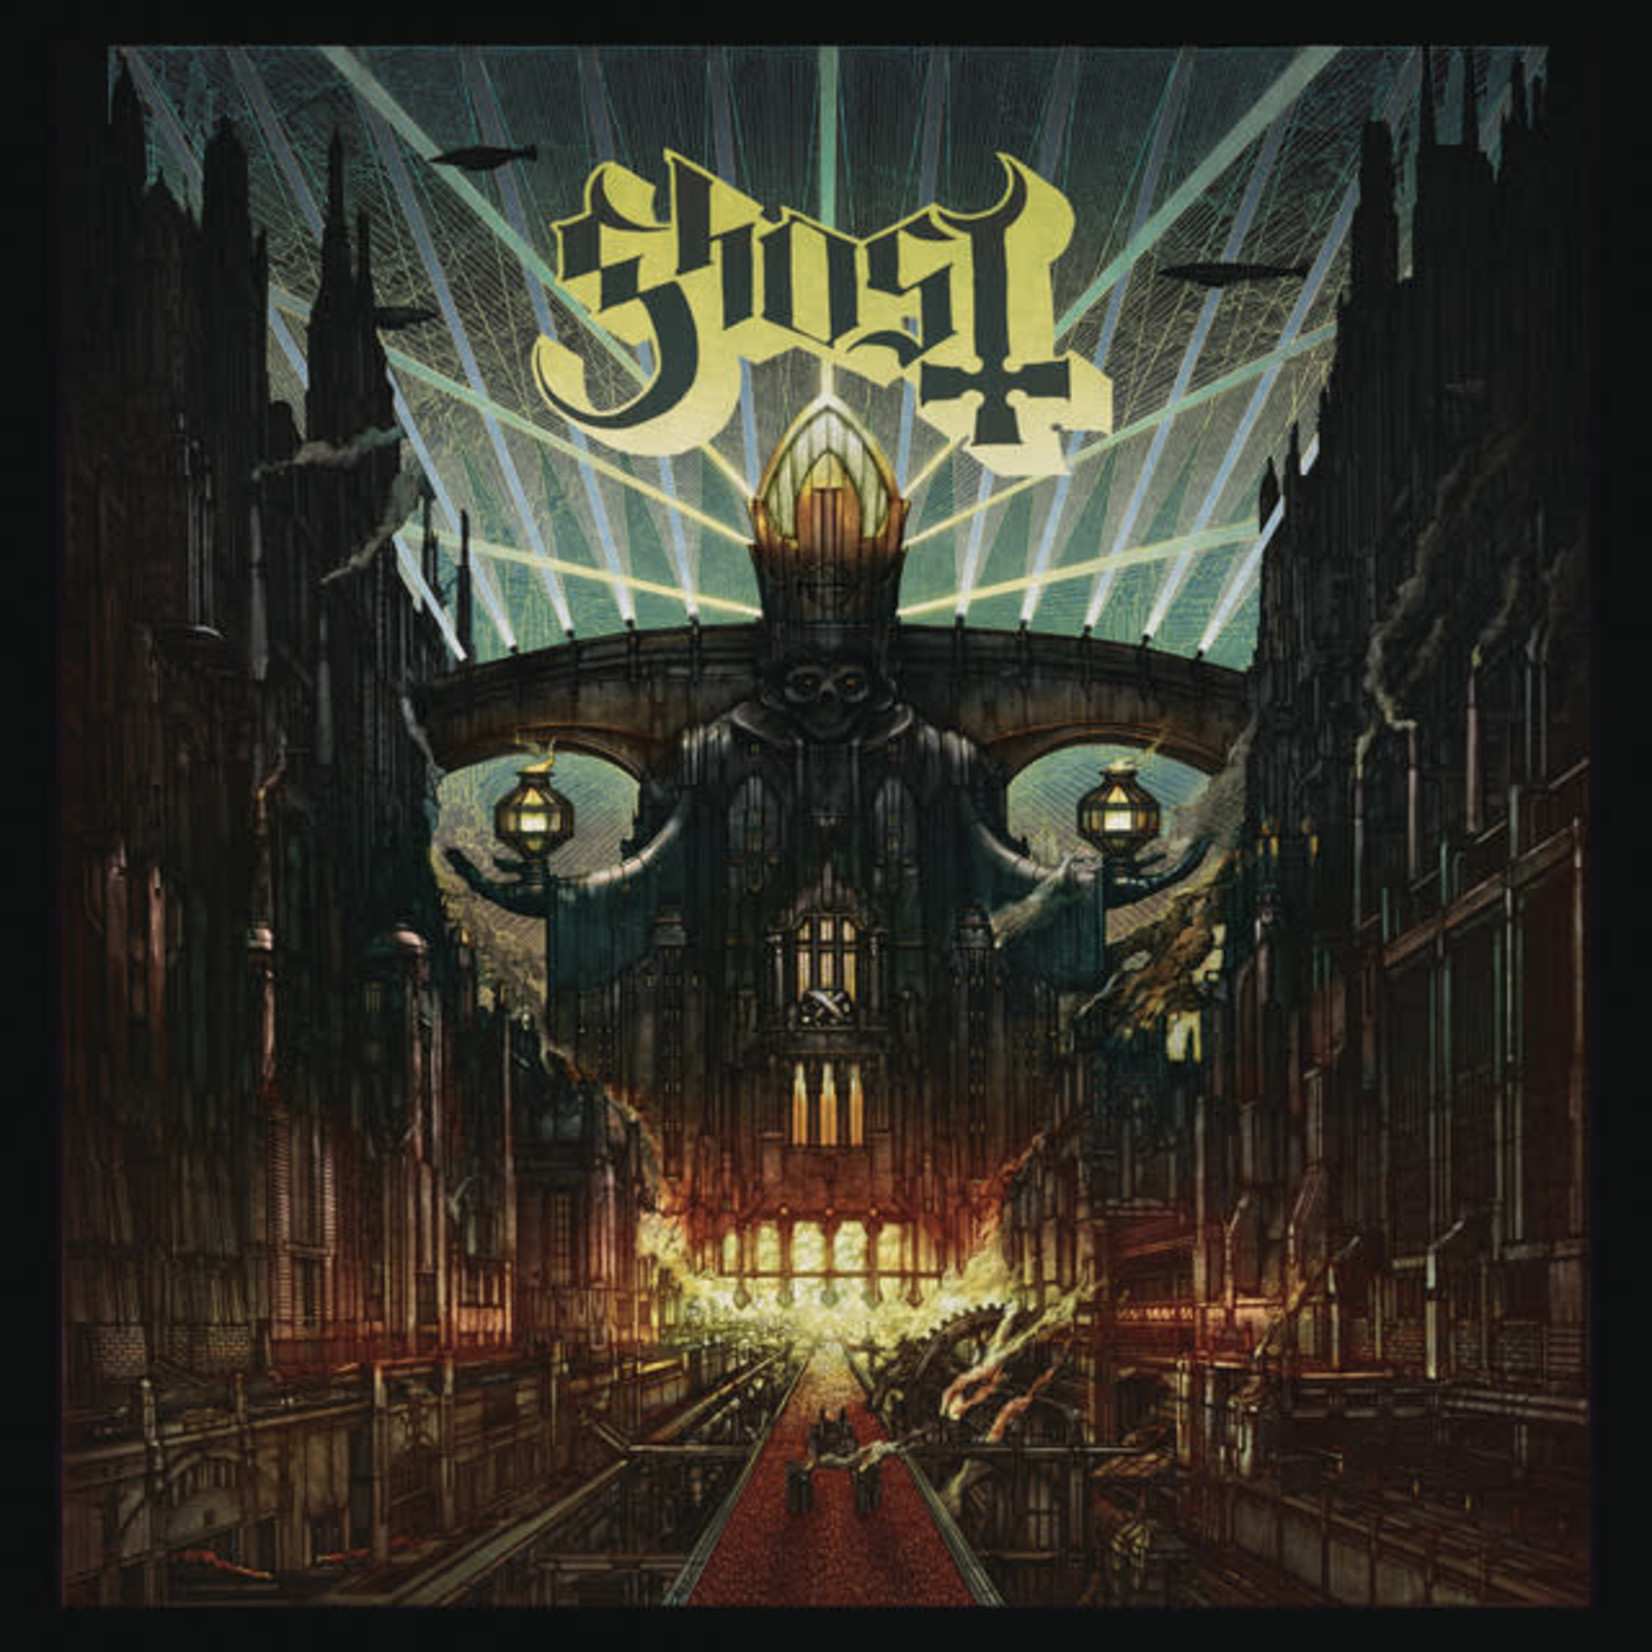 Vinyl Ghost - Meliora